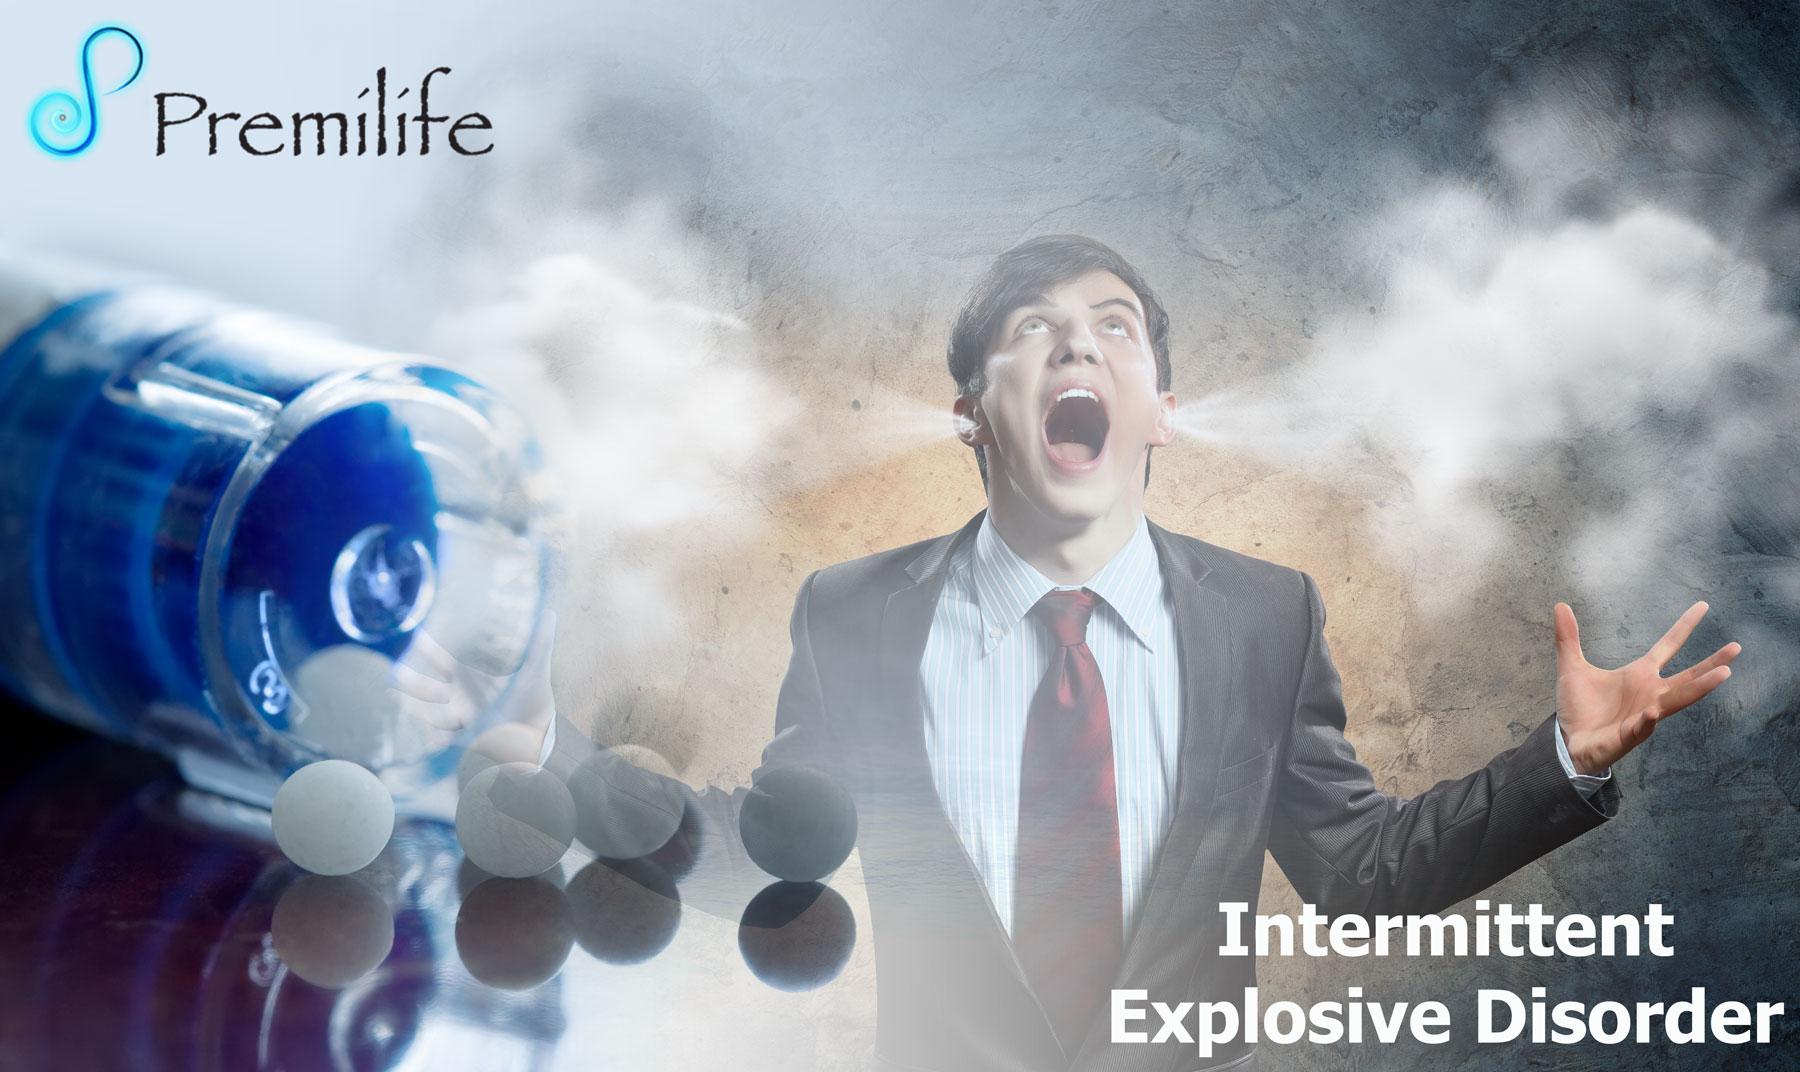 Treating intermittent explosive disorder